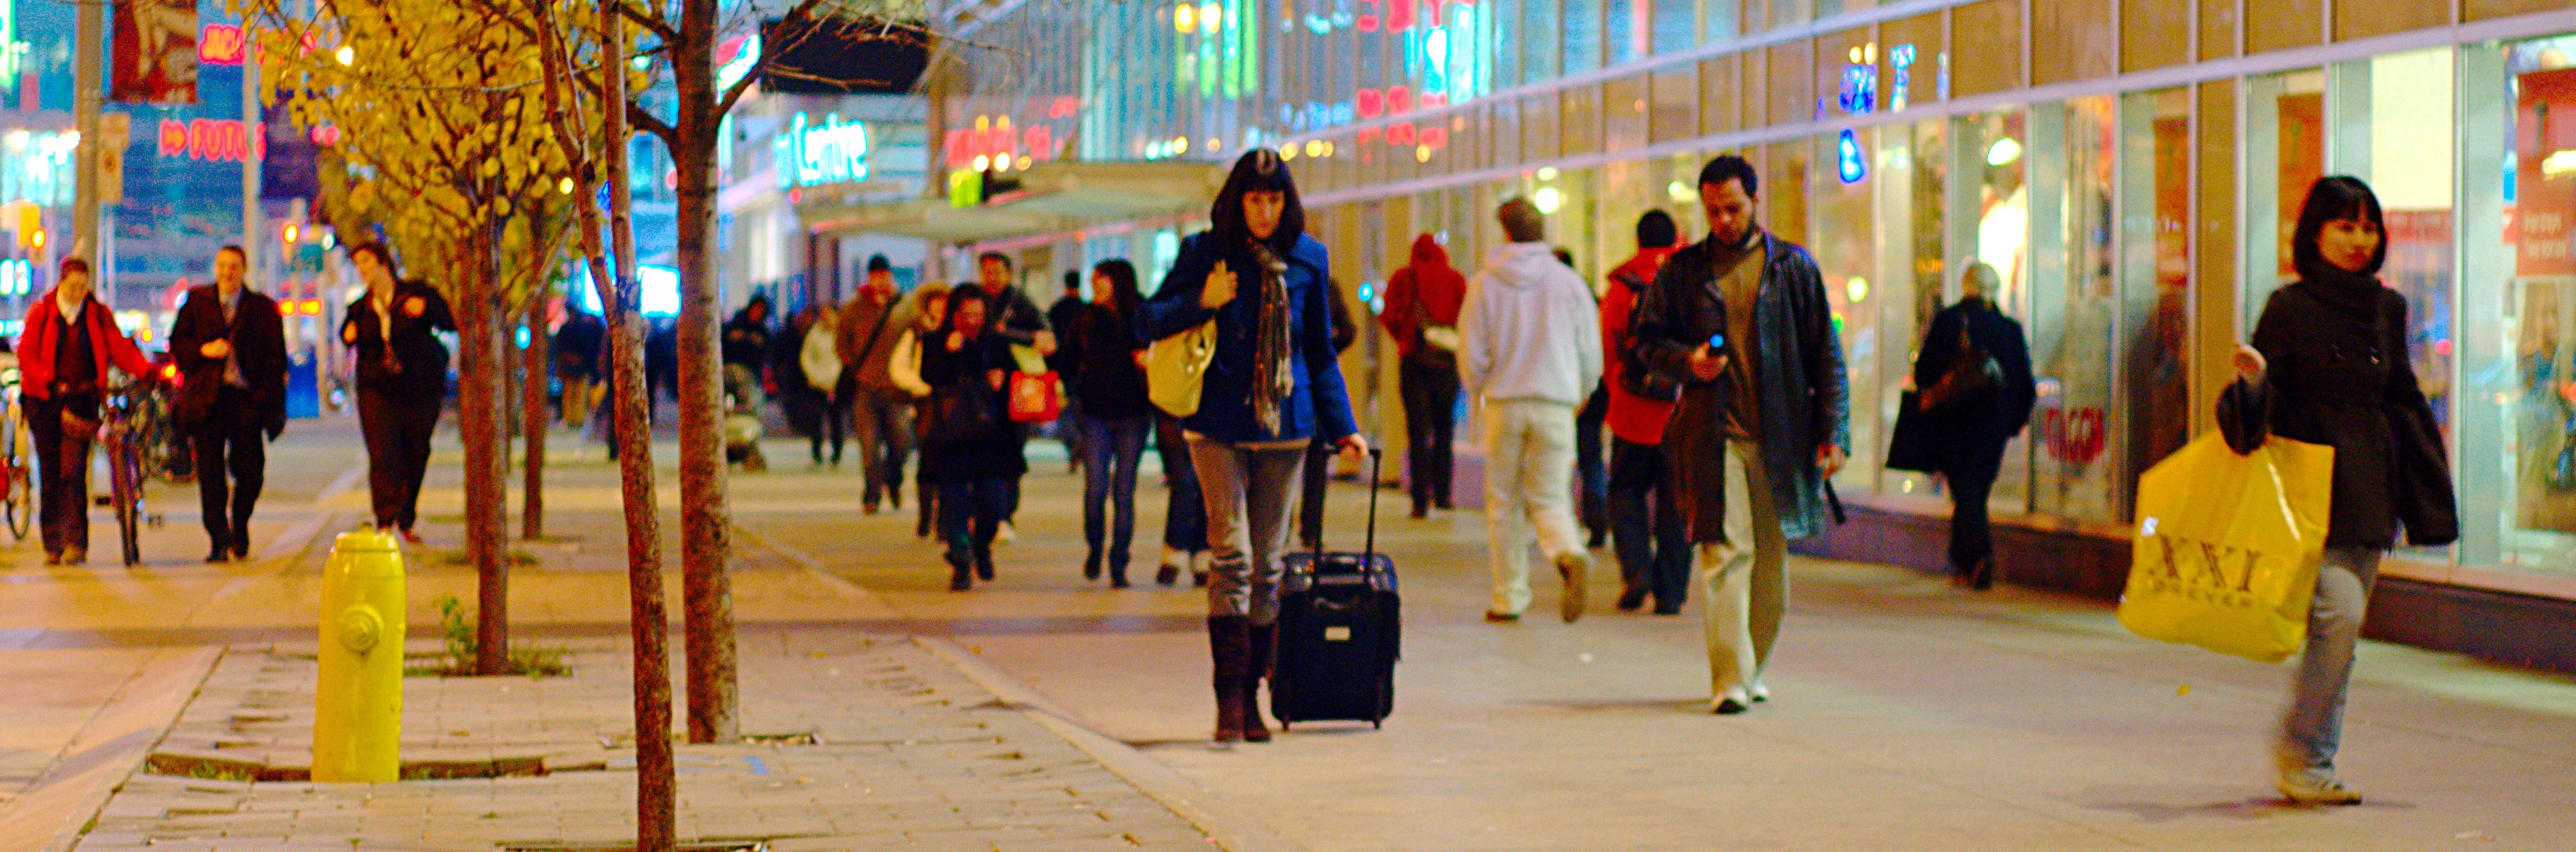 Shoppers_on_Dundas,_near_Yonge